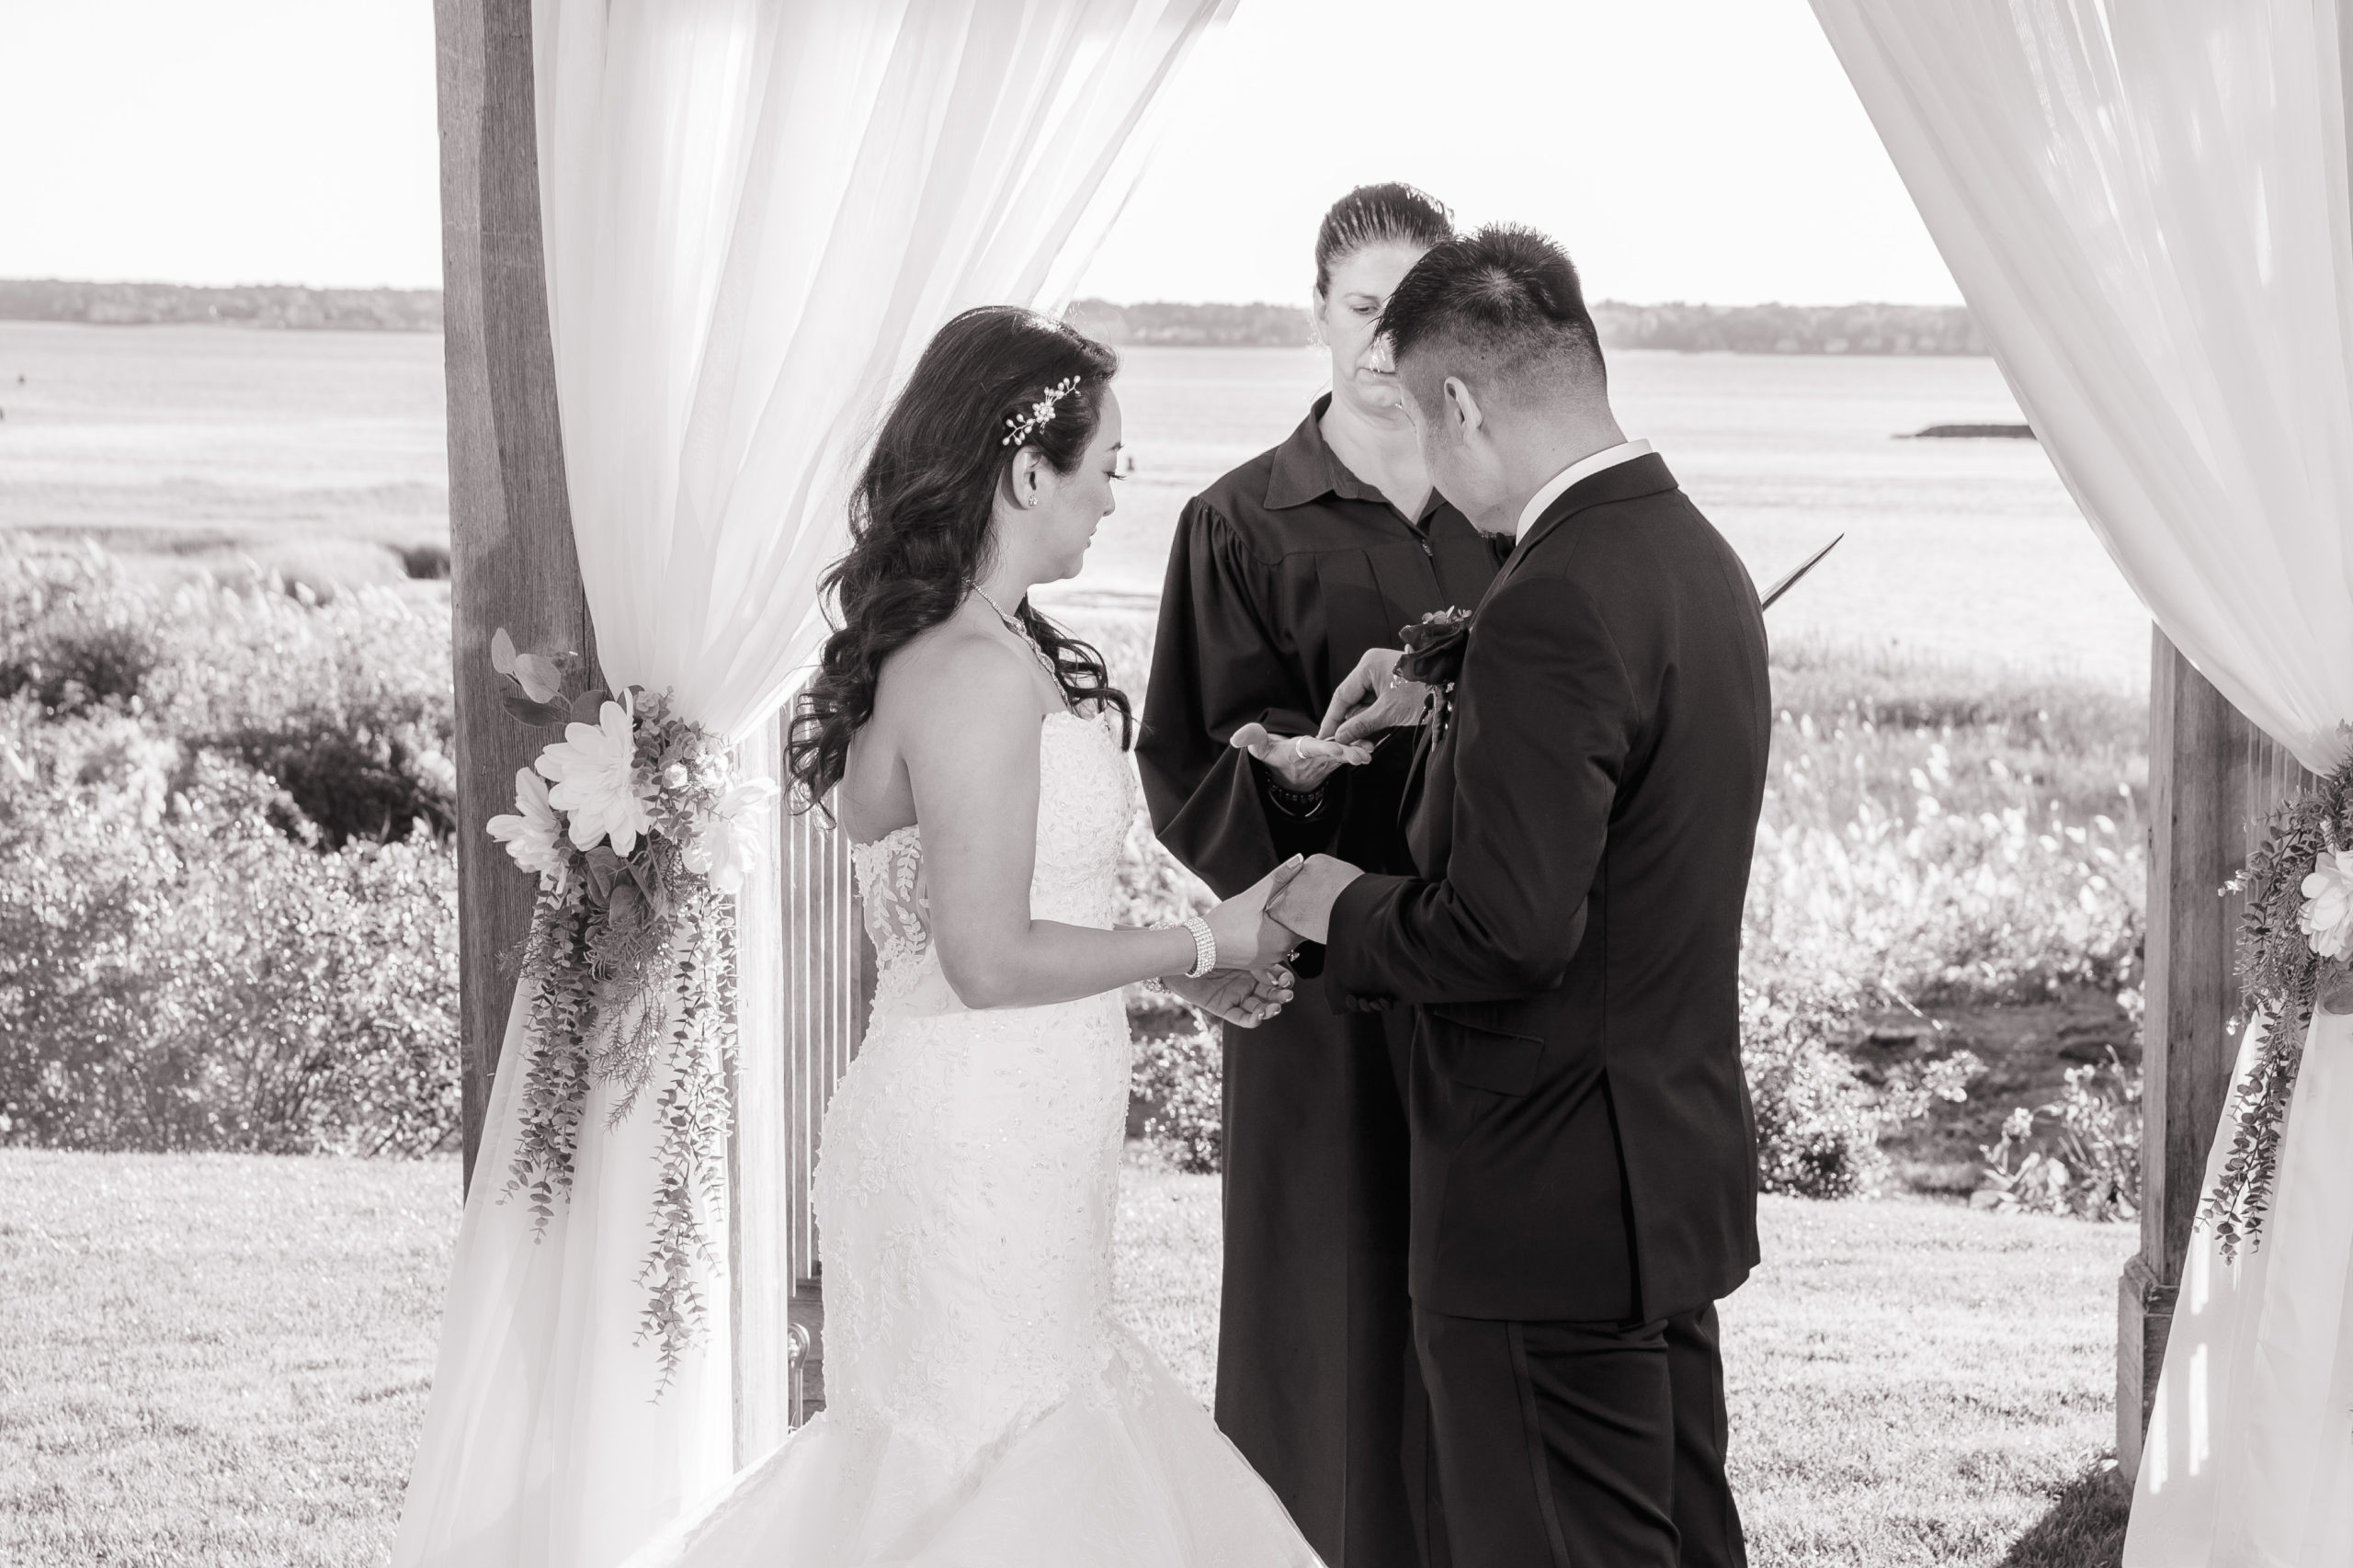 Harbor lights, warwick, rhode island, RI, Tracy Jenkins Photography, RI wedding photographer, Rhode Island wedding photographer, micro-wedding, wedding ceremony, rings, ring exchange